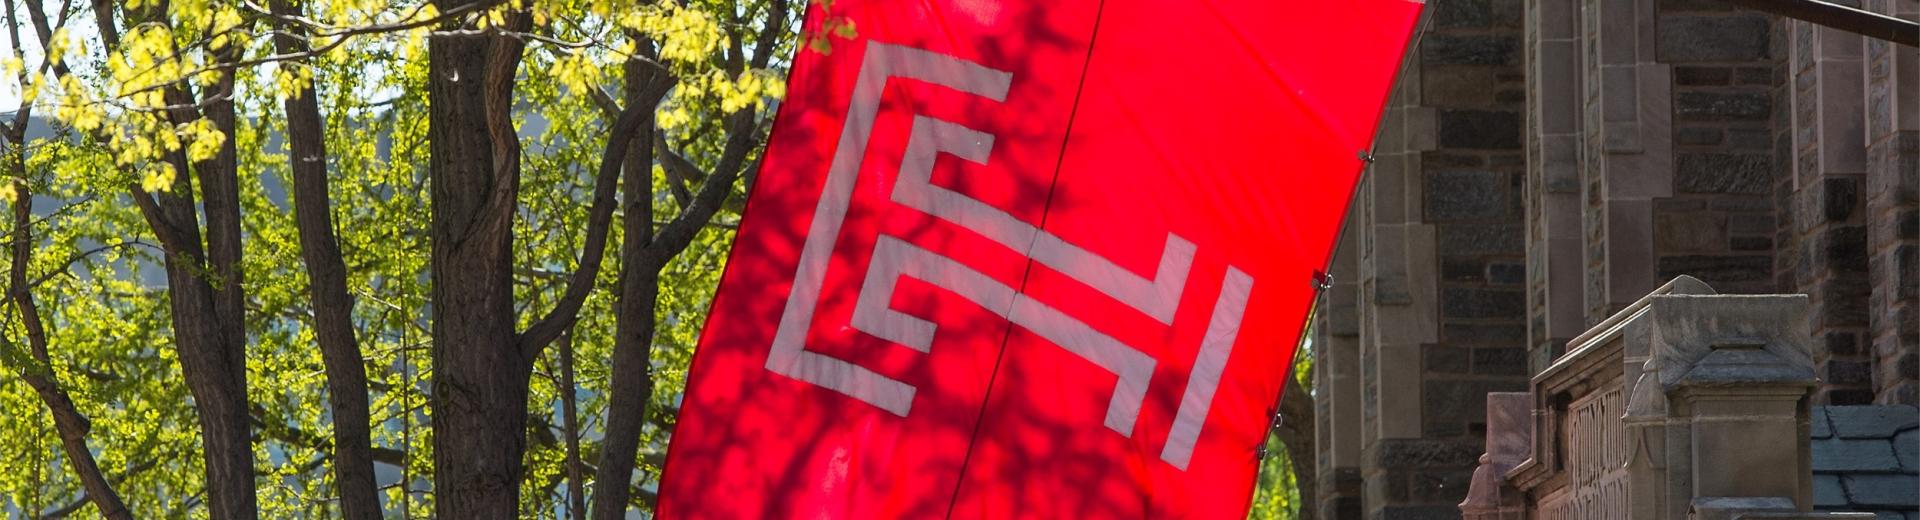 Temple University Flag